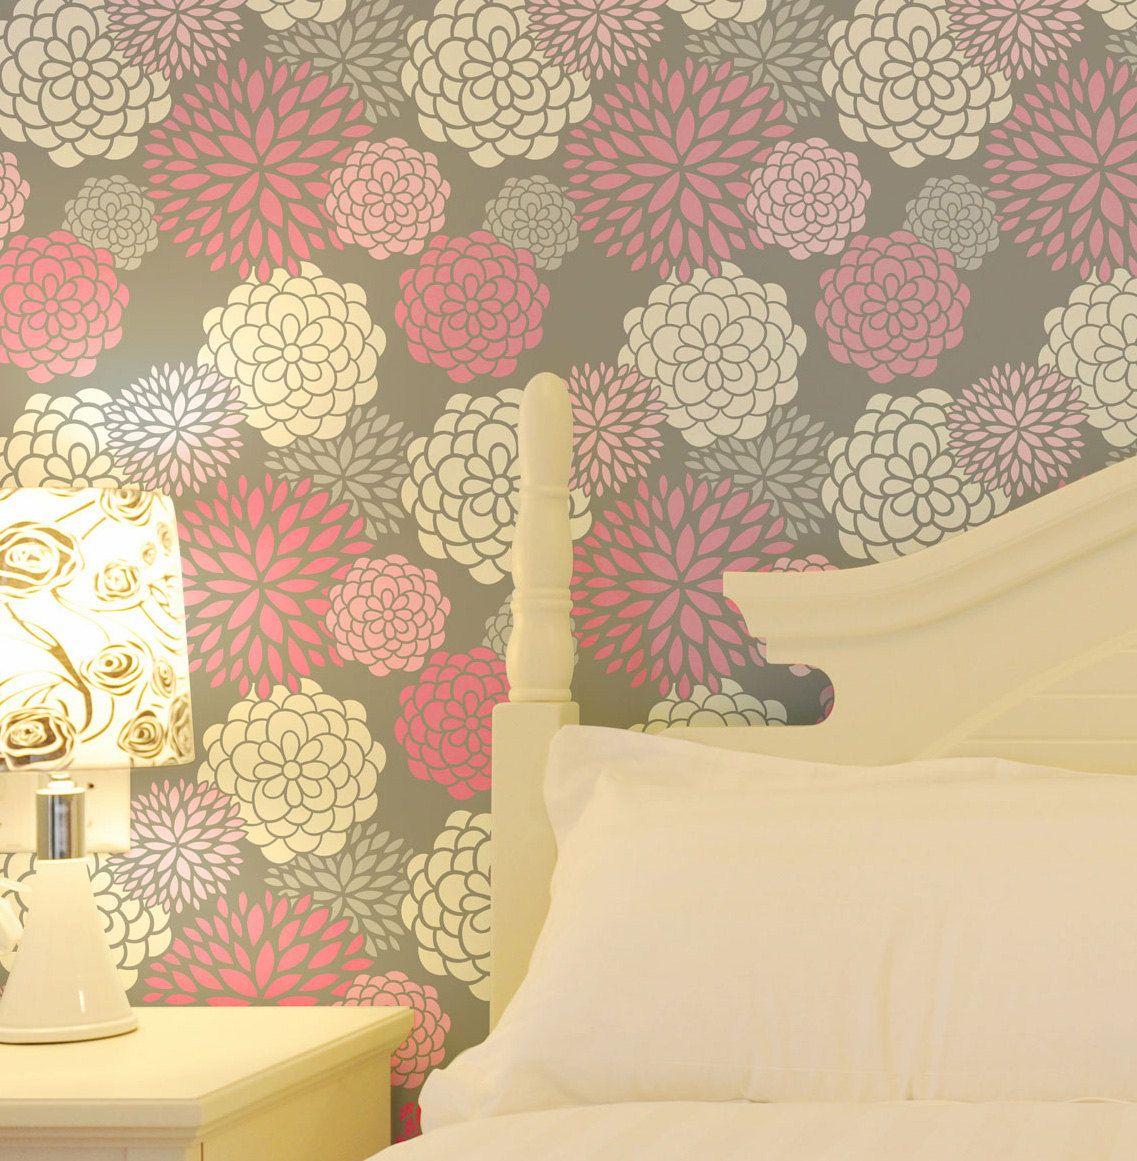 May Flowers 412: Reusable, Wall Stencil, DIY decor | diy | Pinterest ...